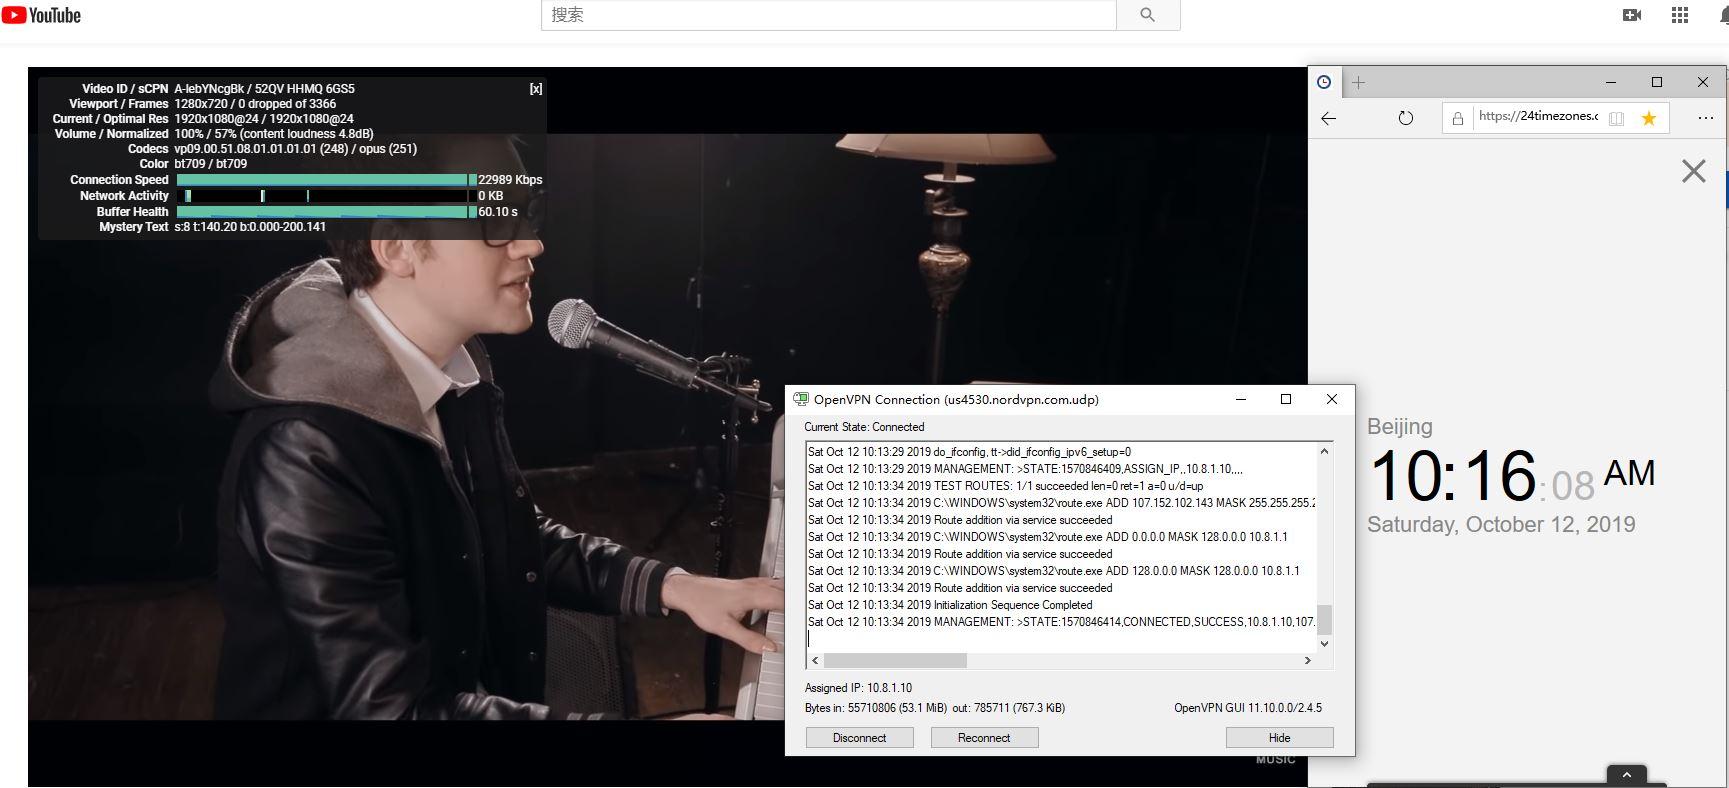 Windows NordVPN OPENVPN GUI US4530-UDP 中国VPN翻墙 科学上网 YouTube测速-20191012